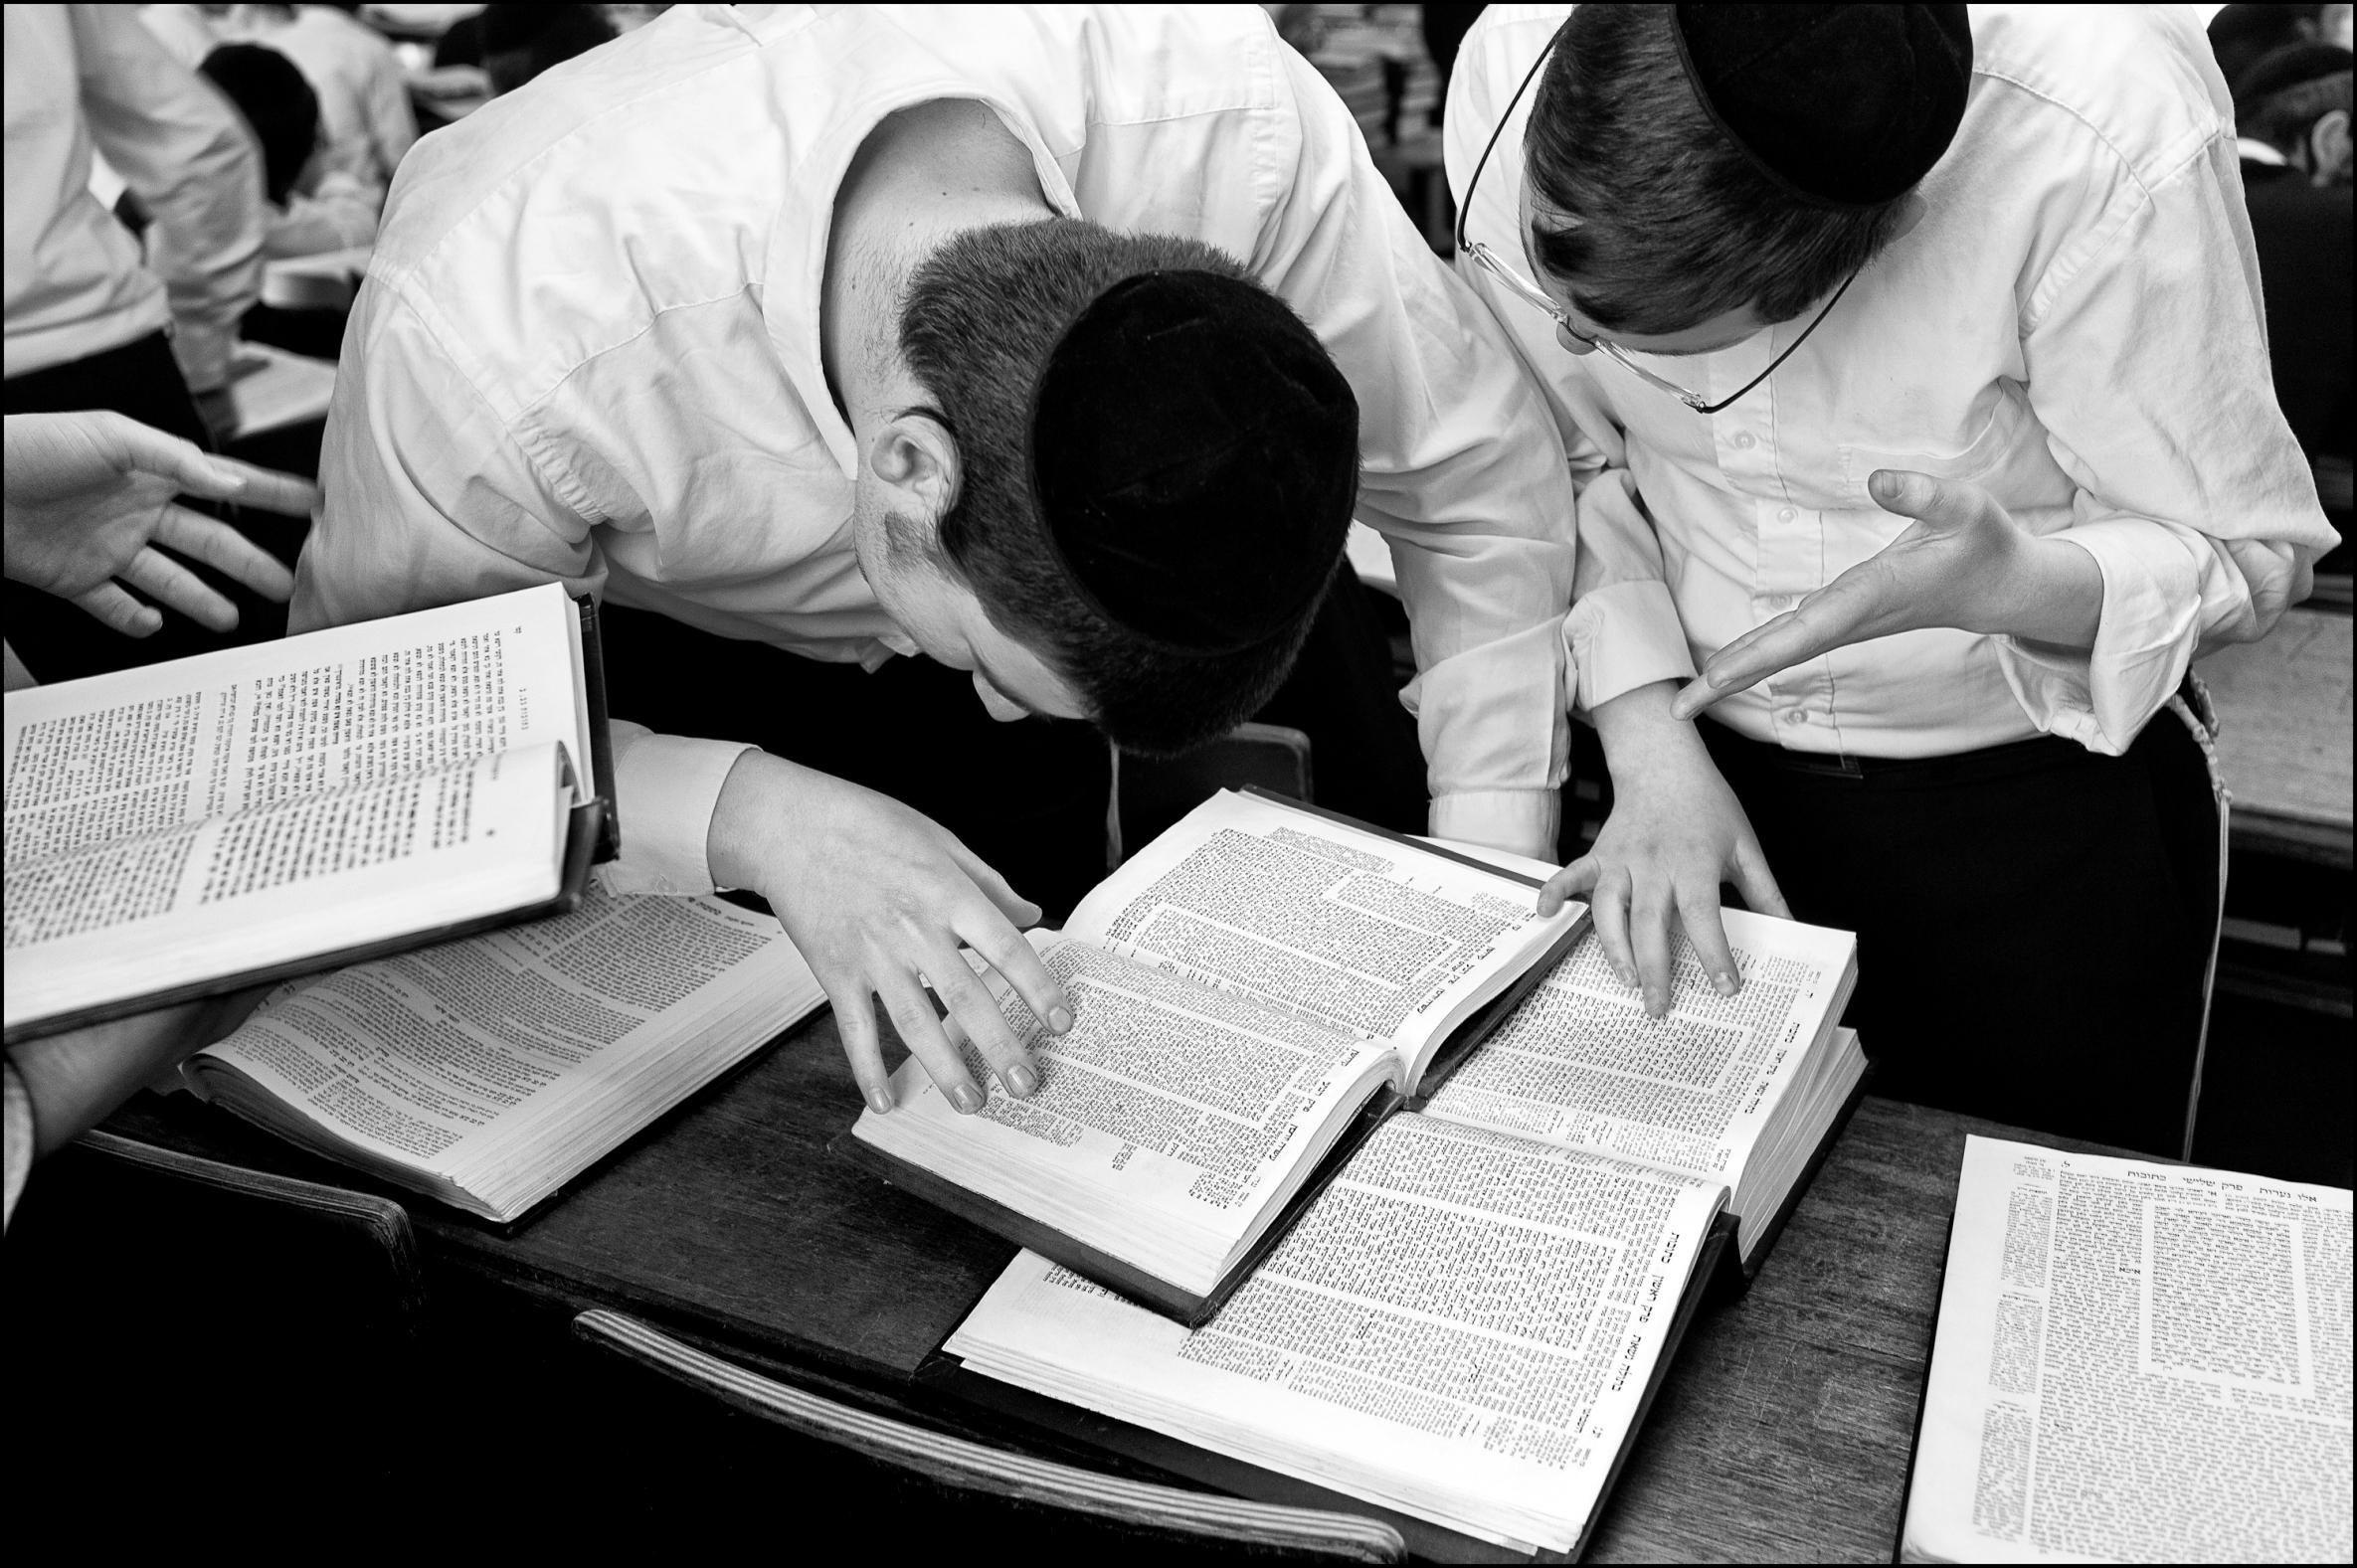 B & w photo of boys studying Jewish texts